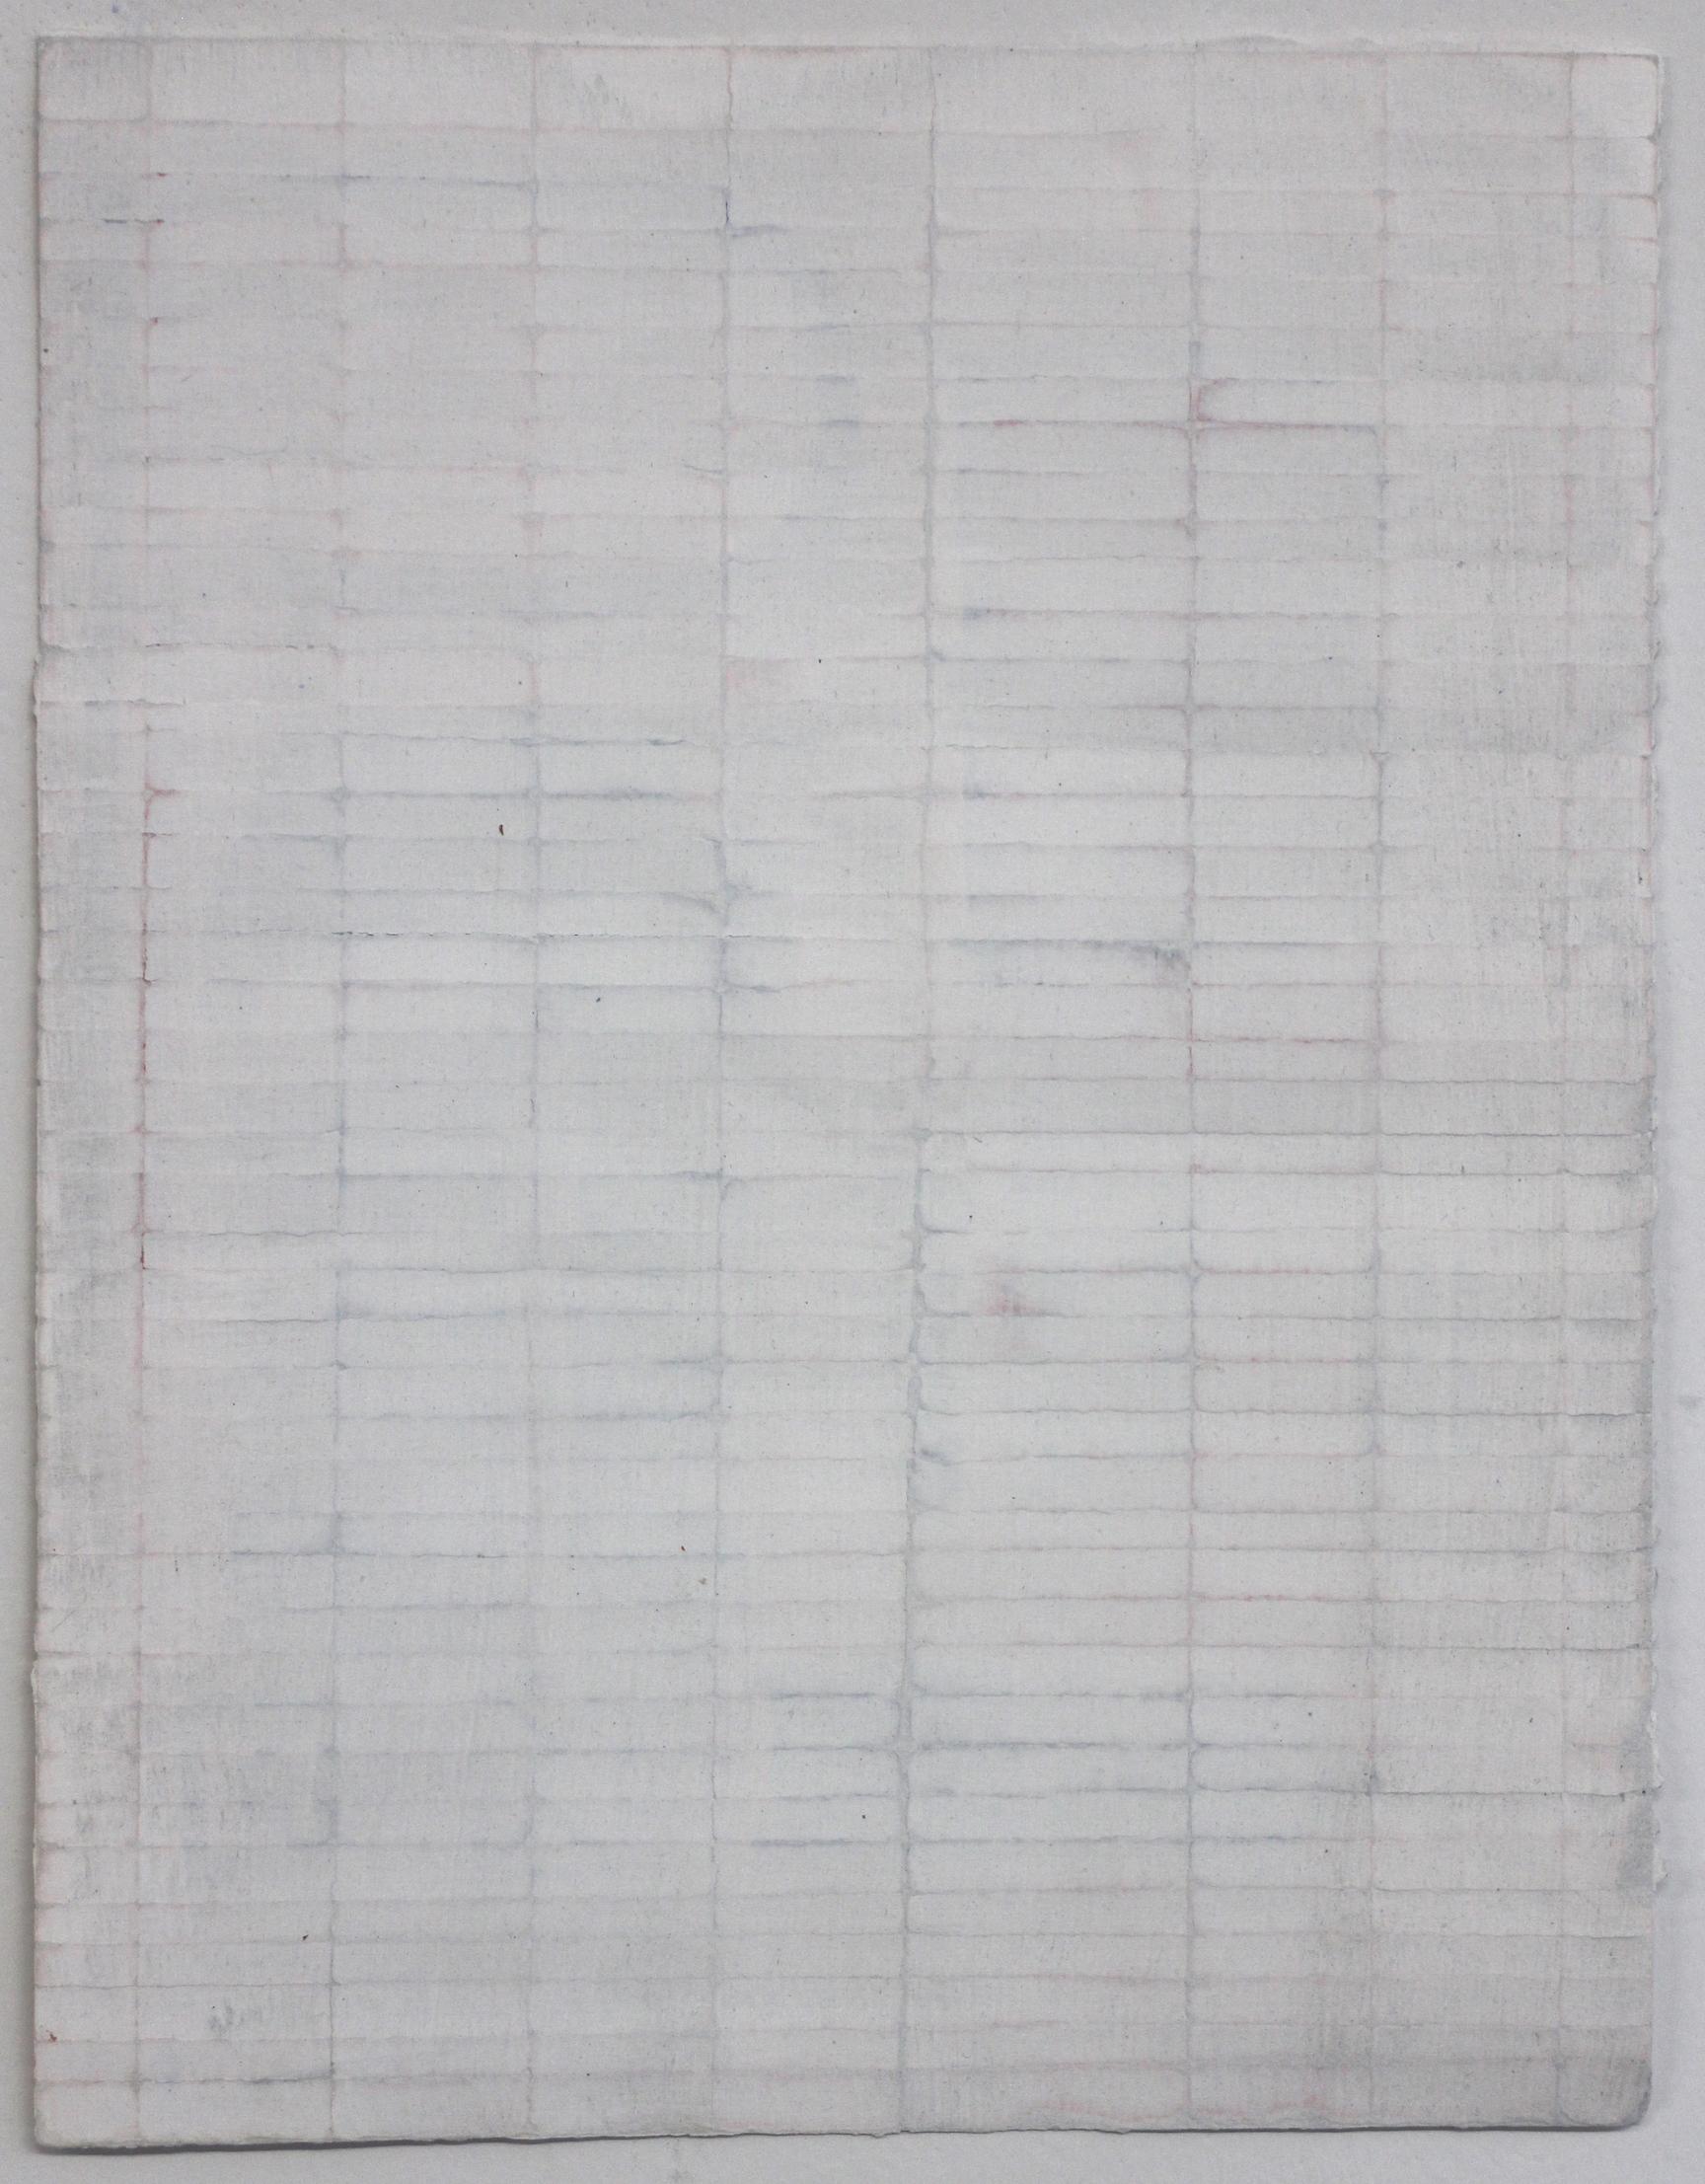 White Line Fold 1.4x1 5.14.19